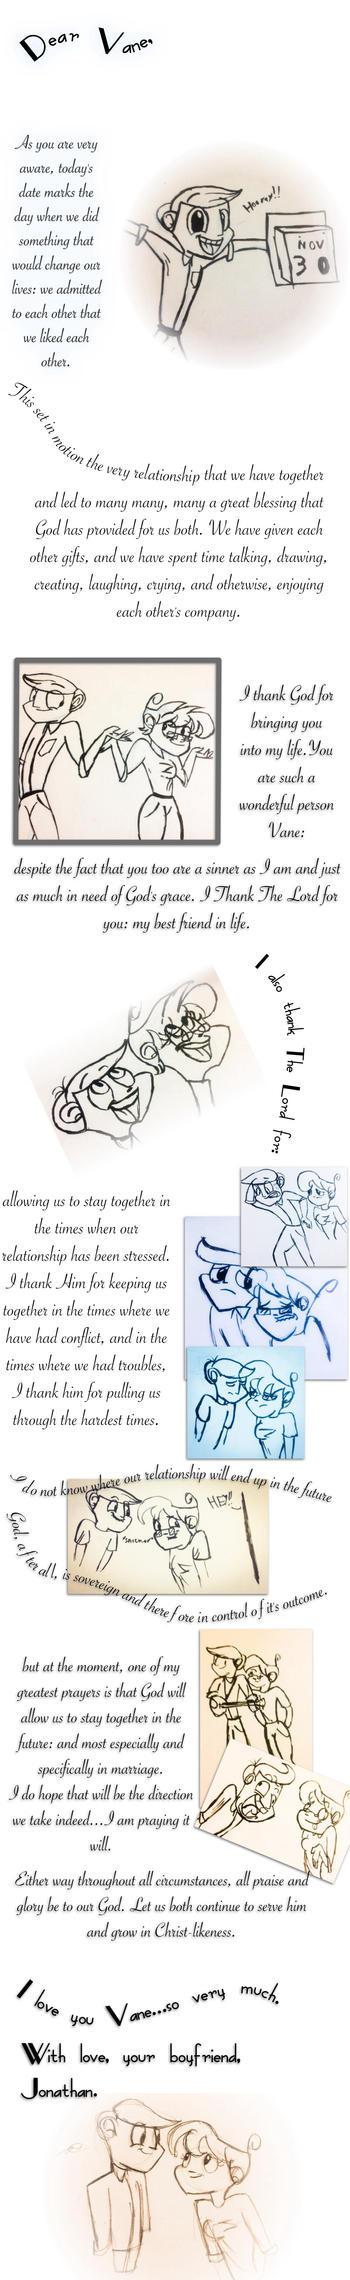 Happy Anniversary Vane! by Jon-The-Hillbilly